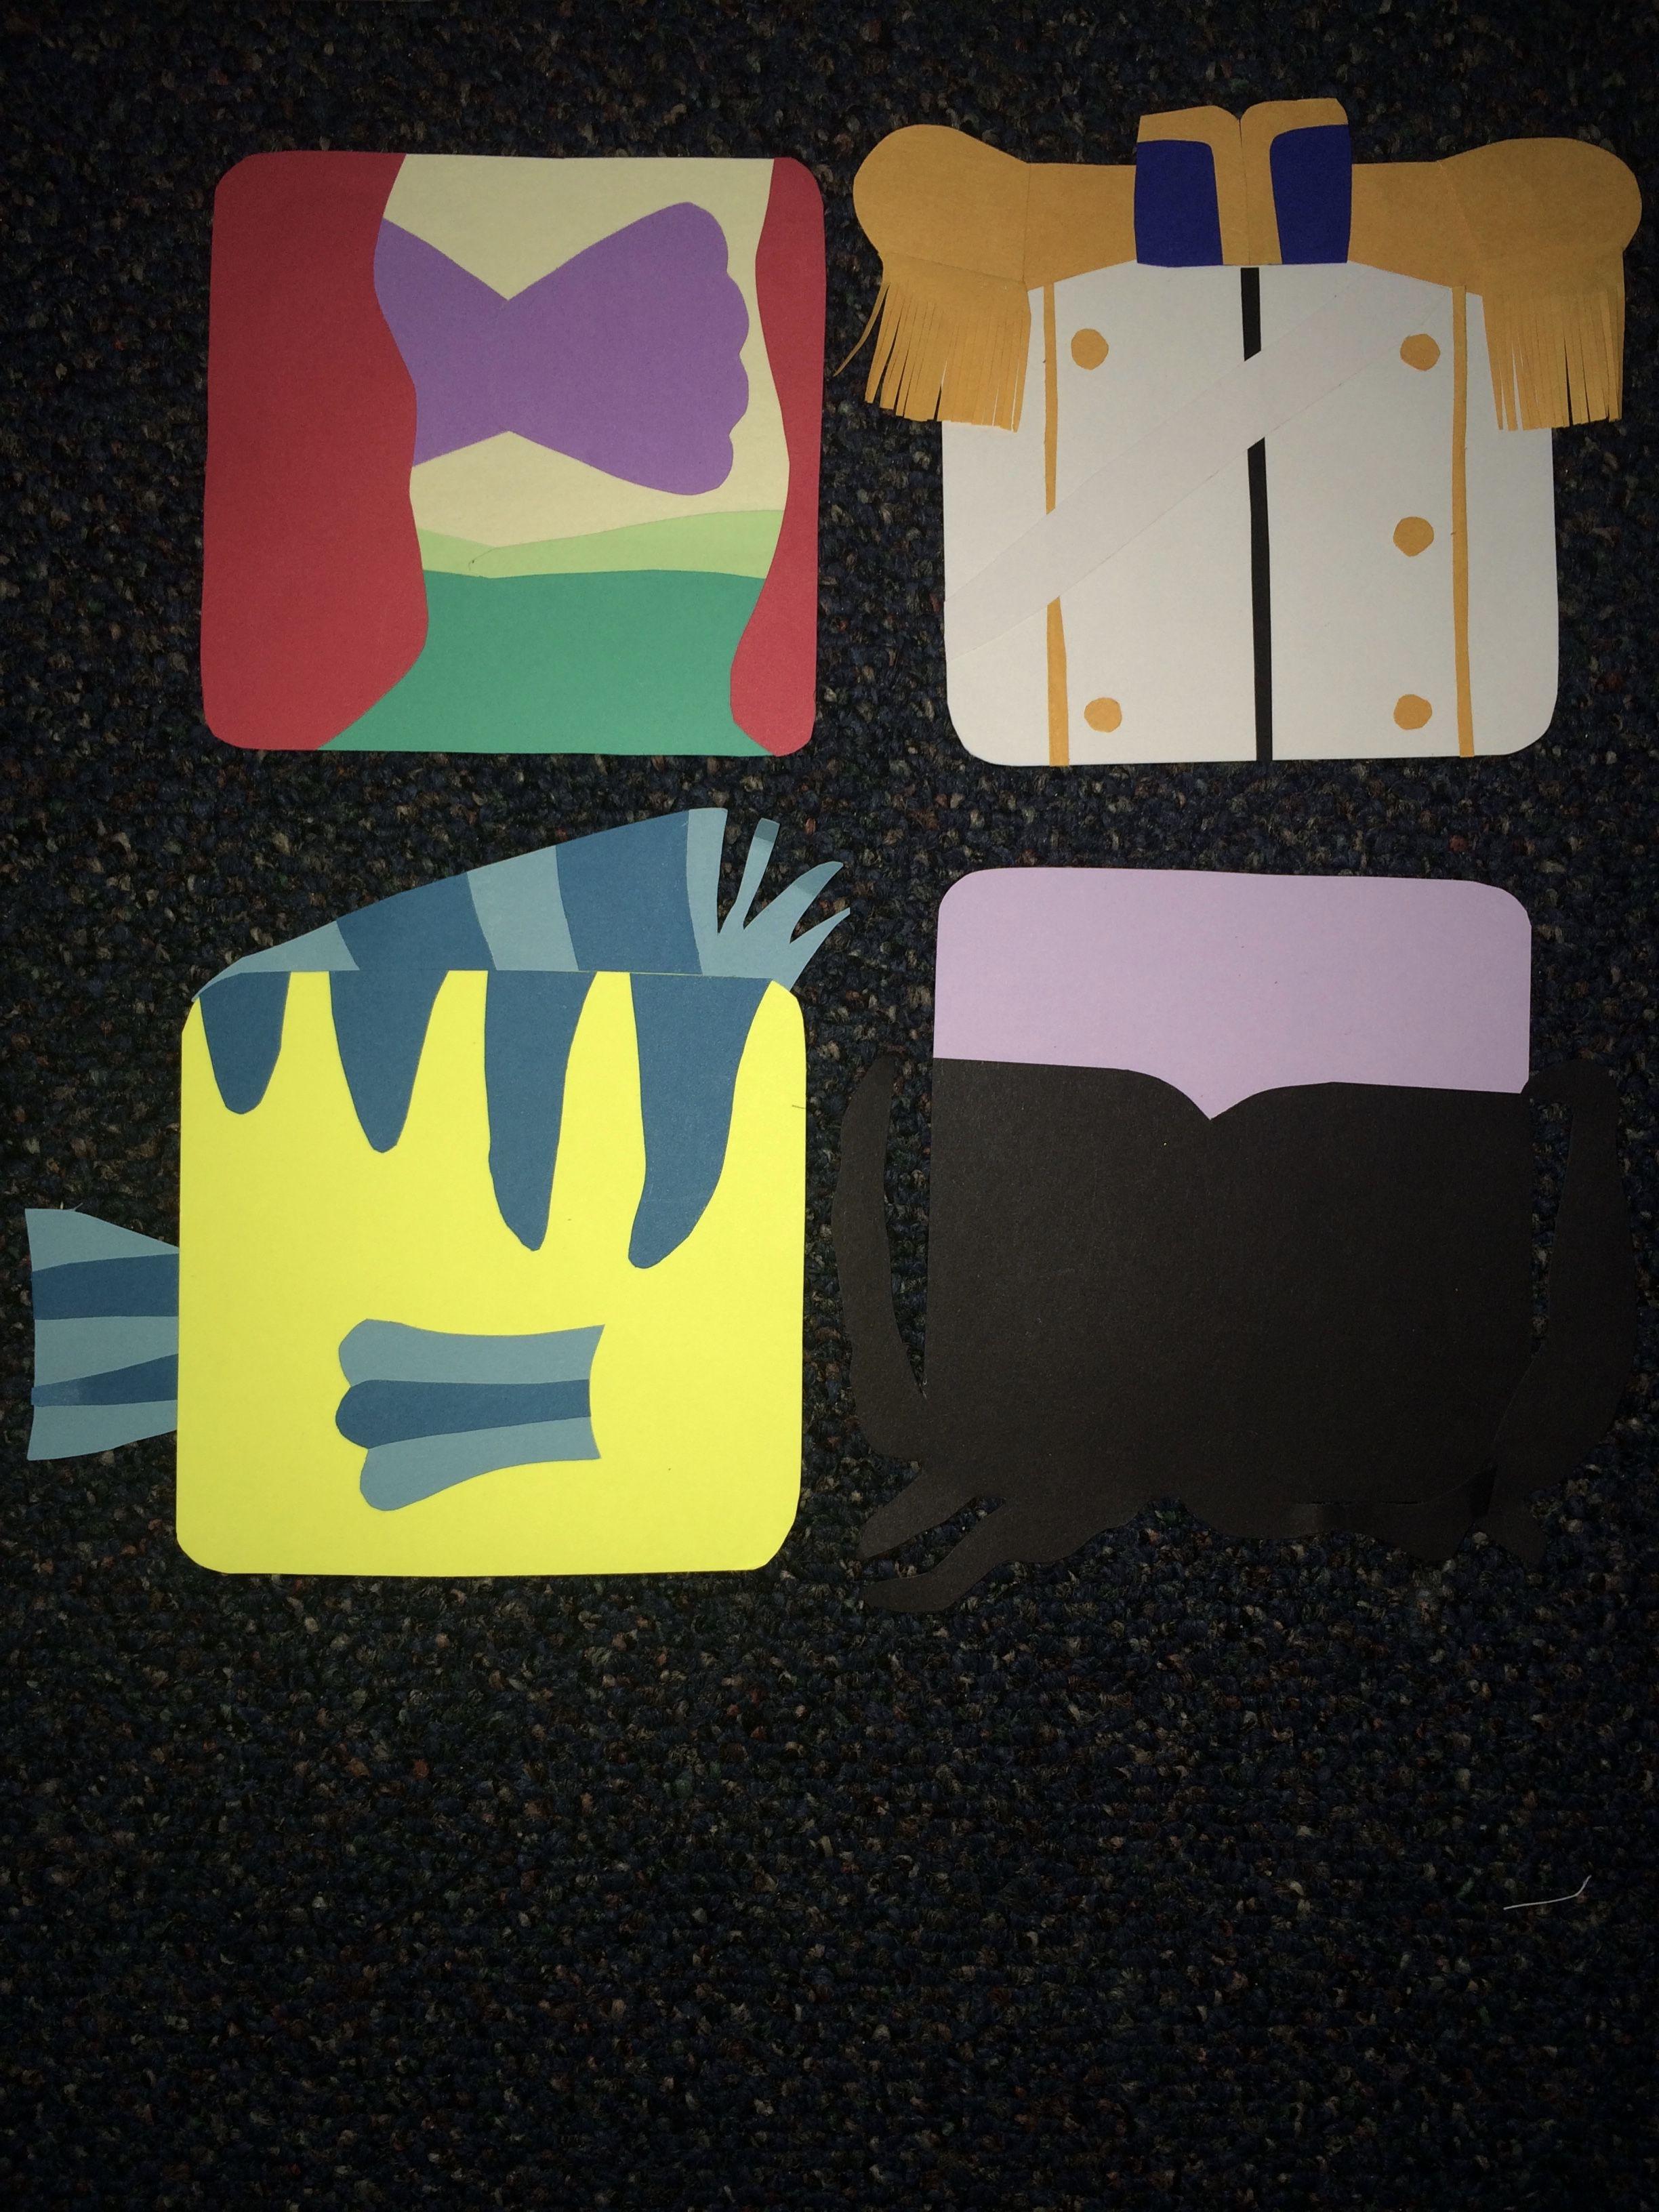 My Disney/Pixar door decs! (made entirely with card stock paper)  & My Disney/Pixar door decs! (made entirely with card stock paper ...